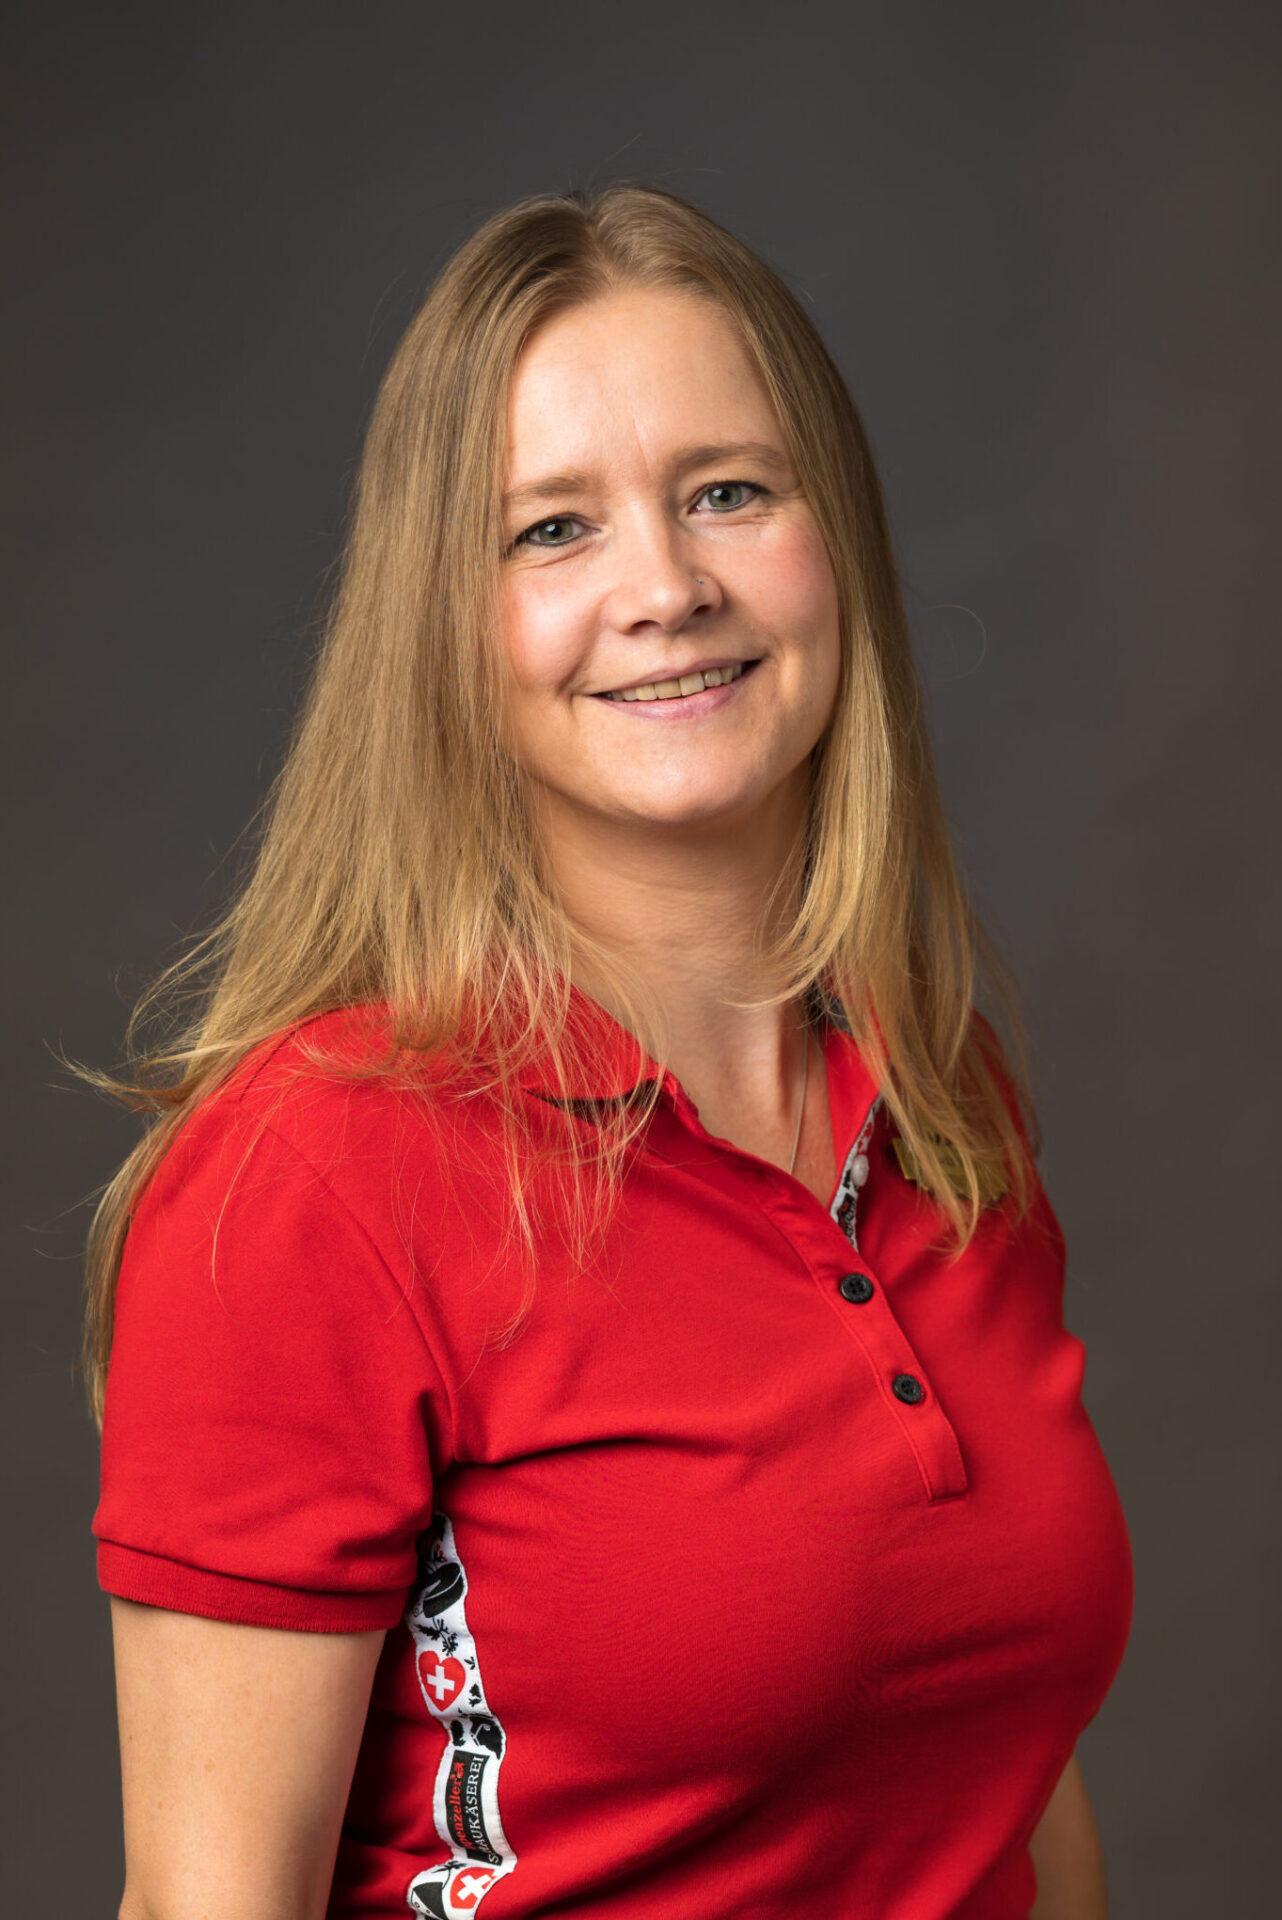 Manuela Meier, Service